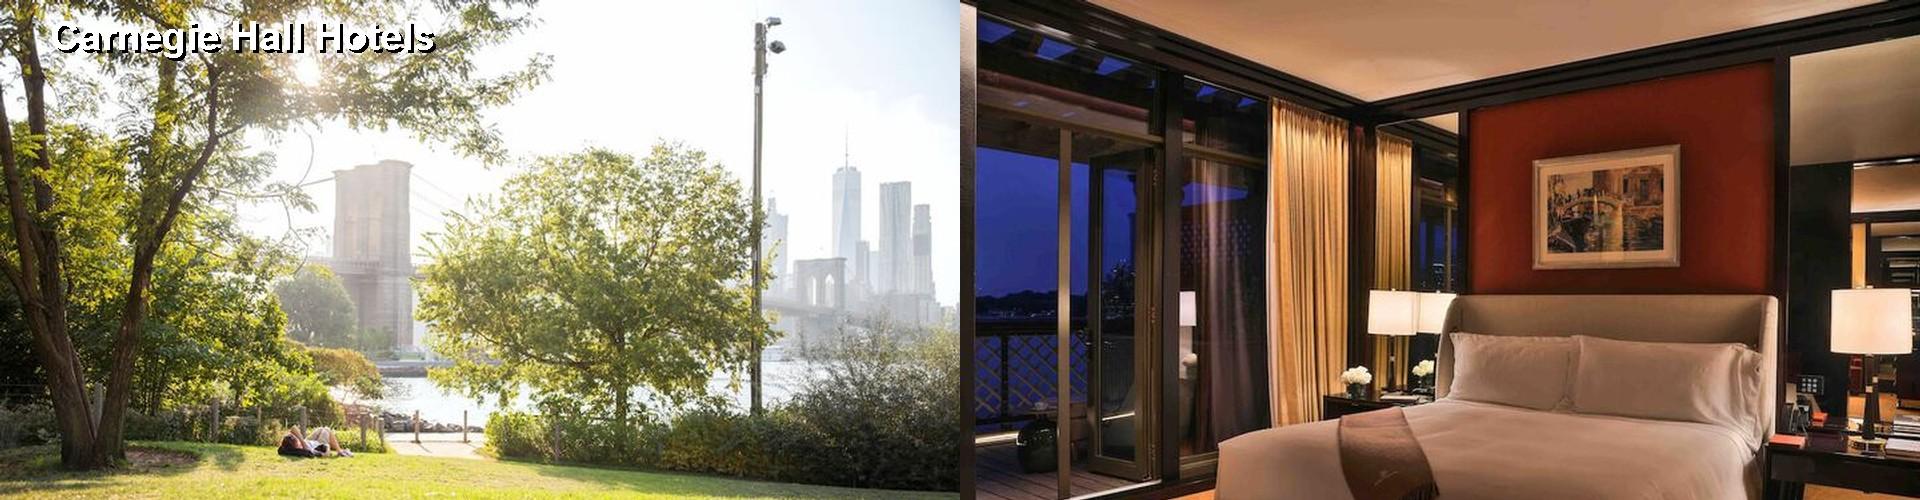 5 Best Hotels Near Carnegie Hall